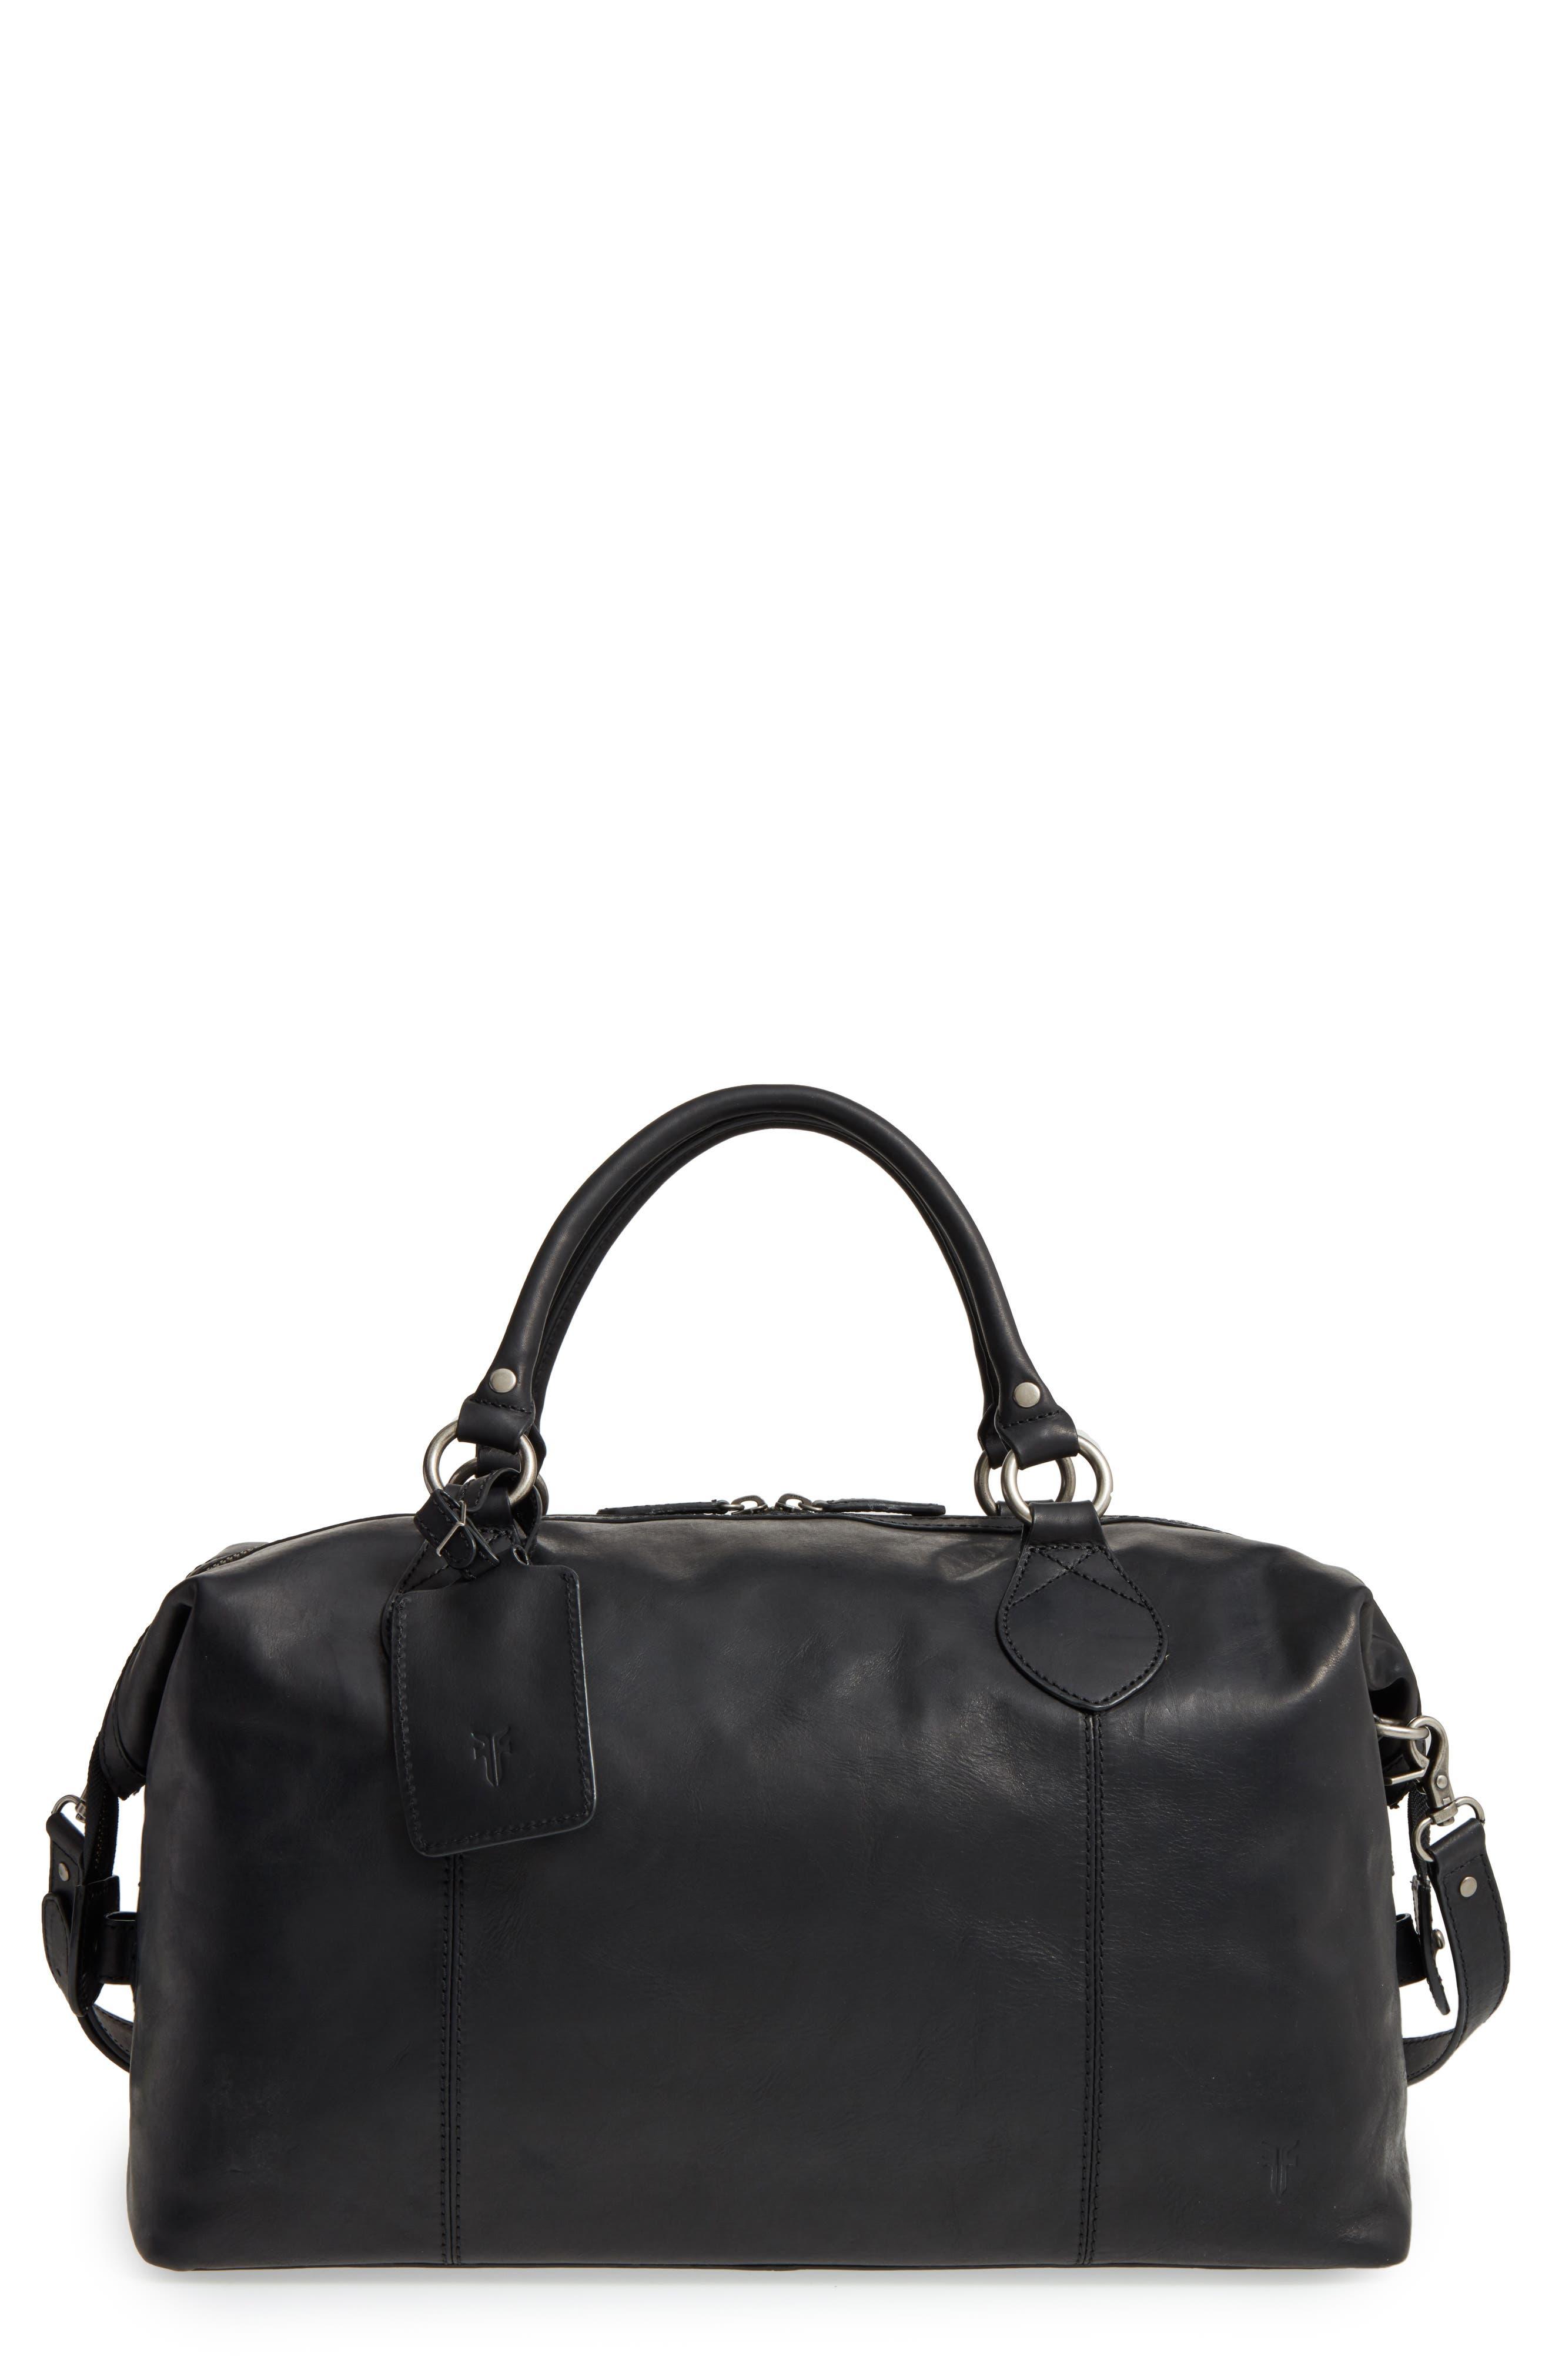 'Logan' Leather Overnight Bag,                             Main thumbnail 1, color,                             001